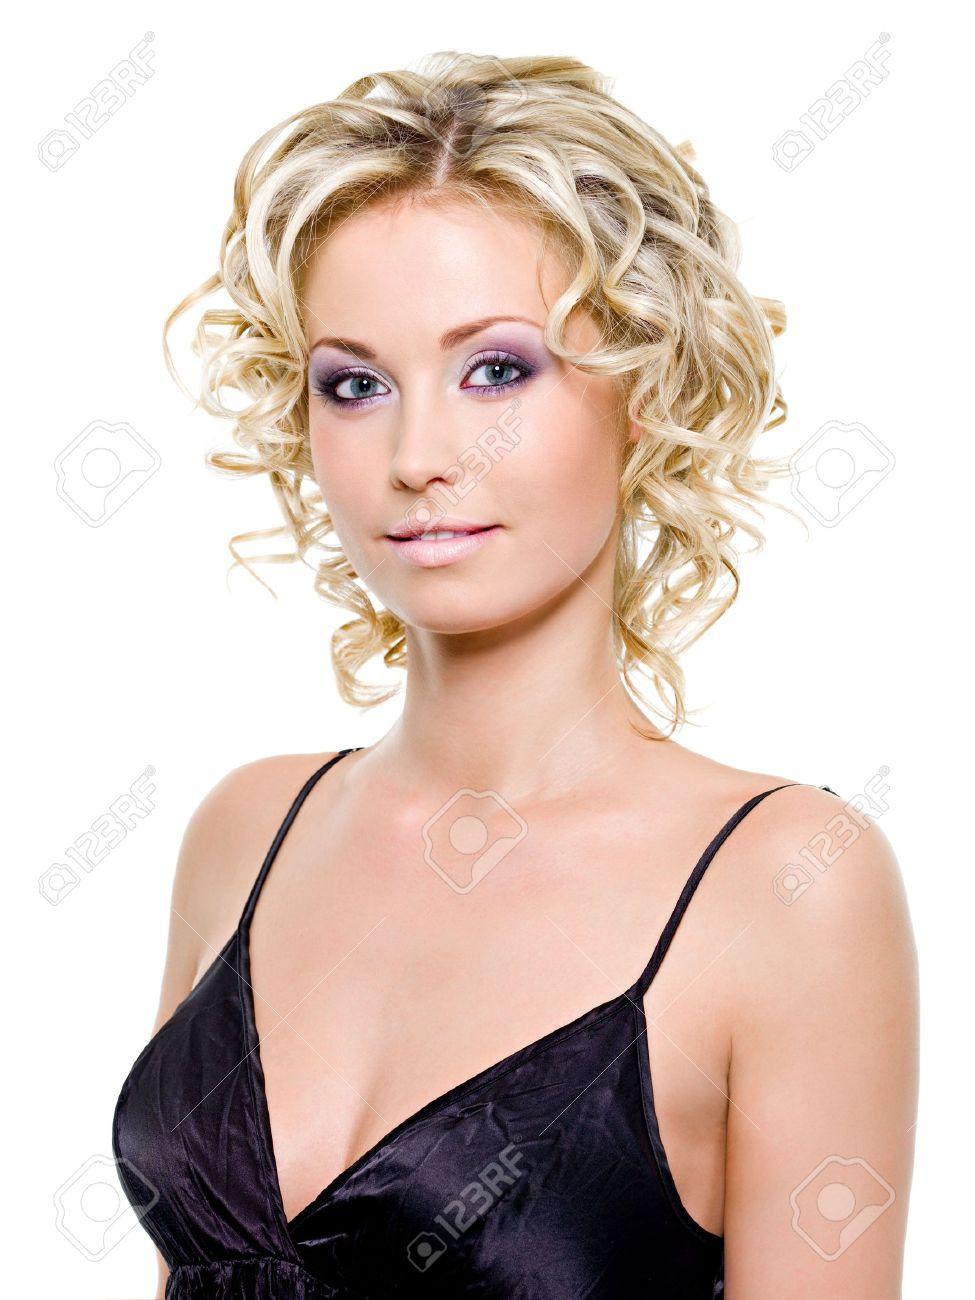 Beautiful smiling woman portrait - isolated on white background Stock Photo - 6808905